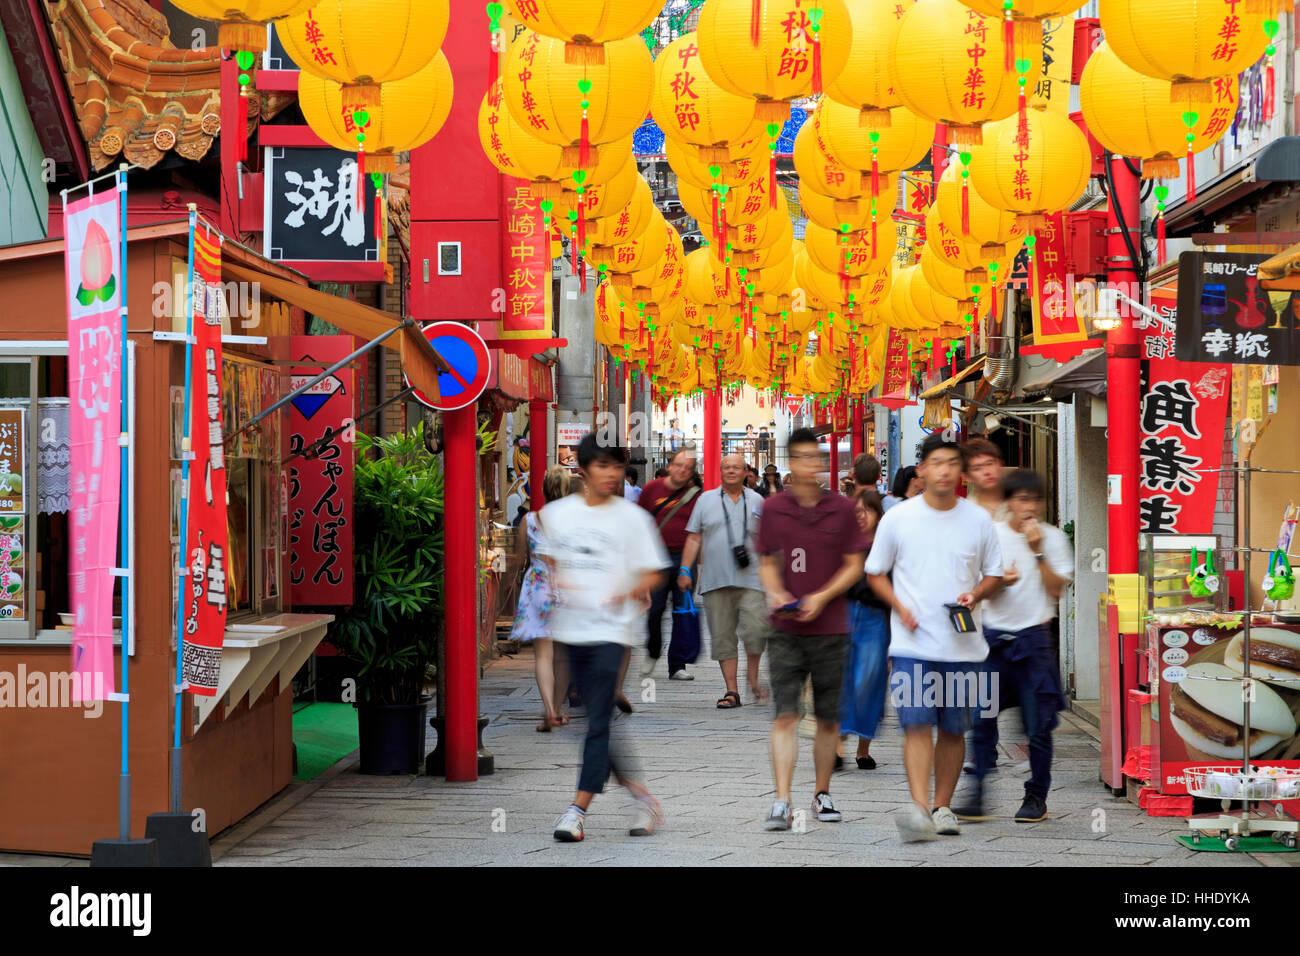 Chinatown, Nagasaki, Kyushu Island, Japan - Stock Image